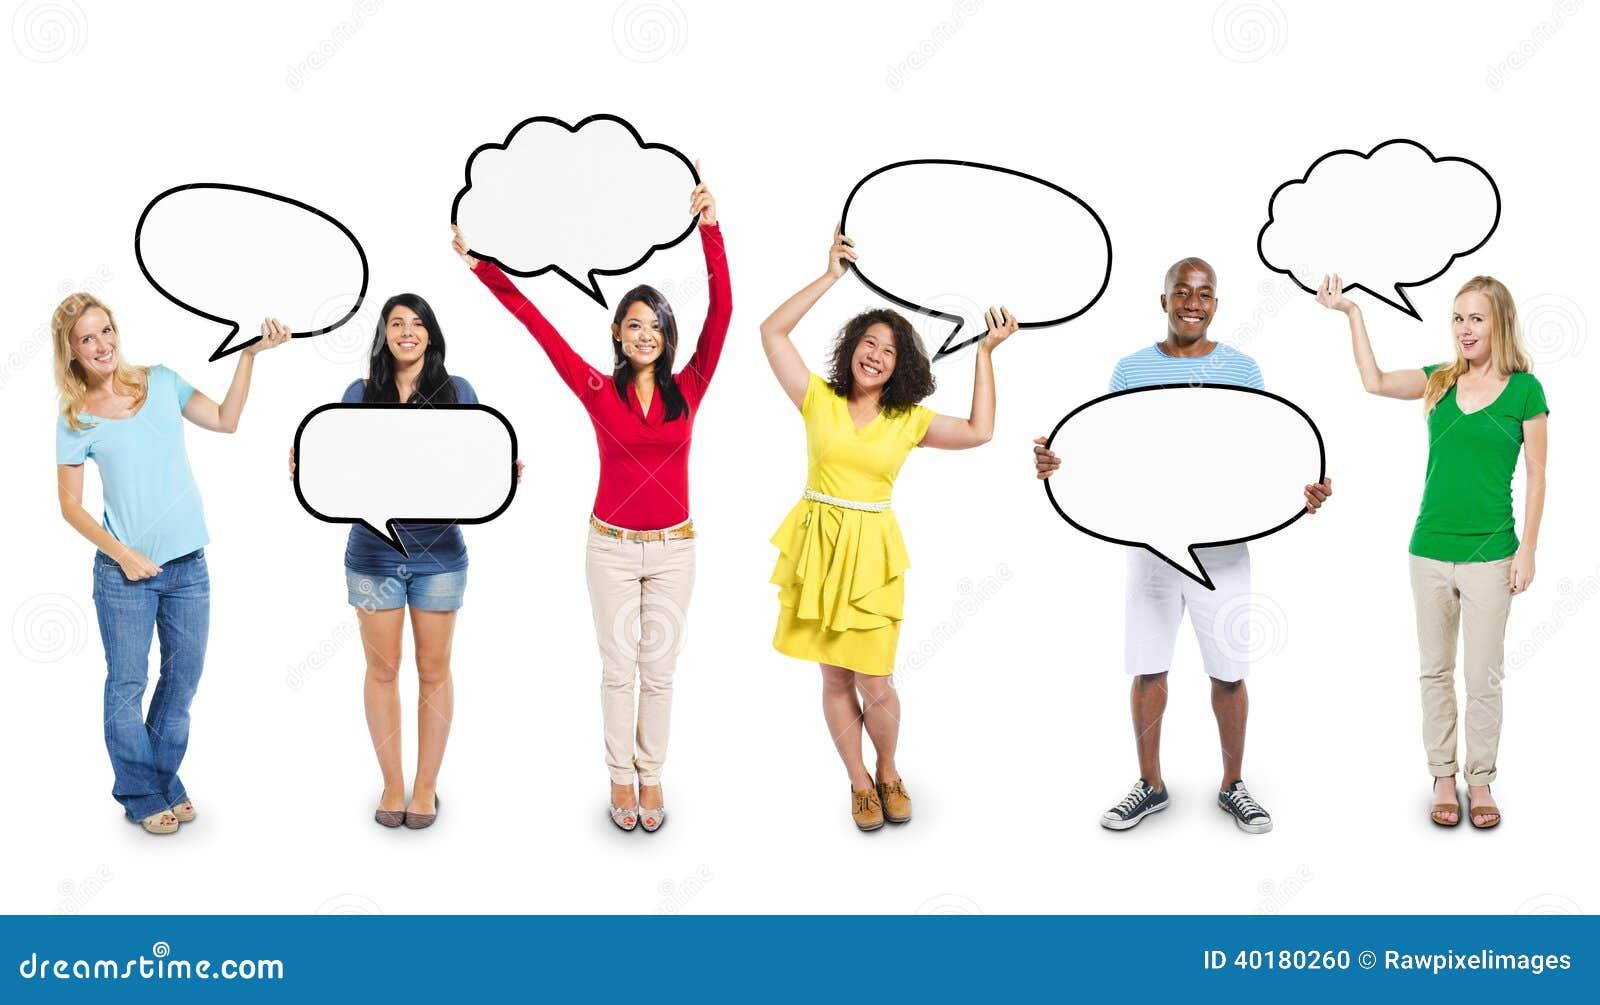 multiethnic diverse people holding blank speech bubbles